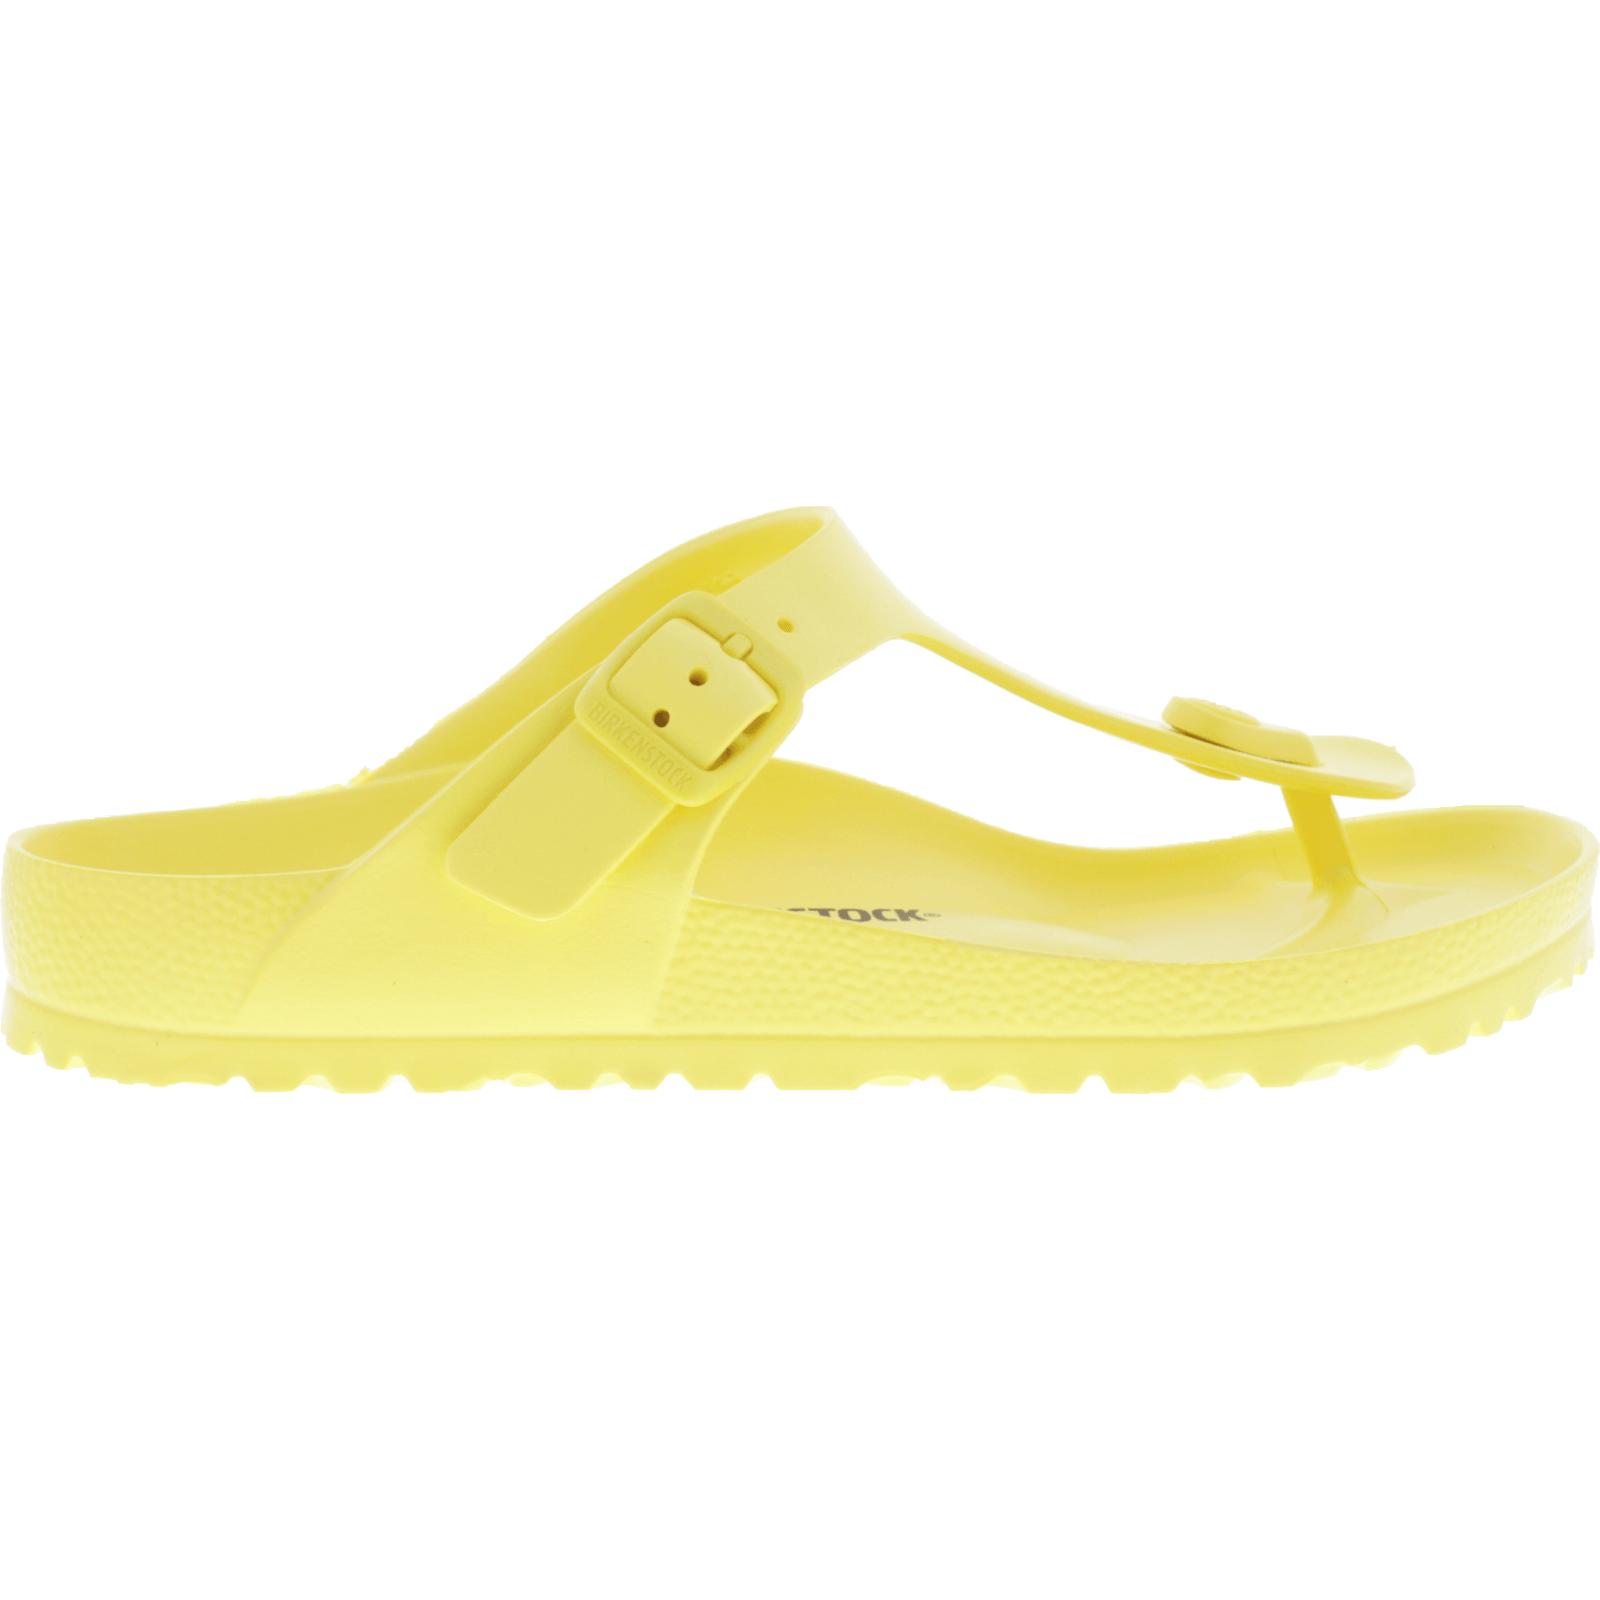 Birkenstock Modell: EVA Gizeh Vibrant Yellow EVA Weite: Normal Art: 1014566 Badeschuhe